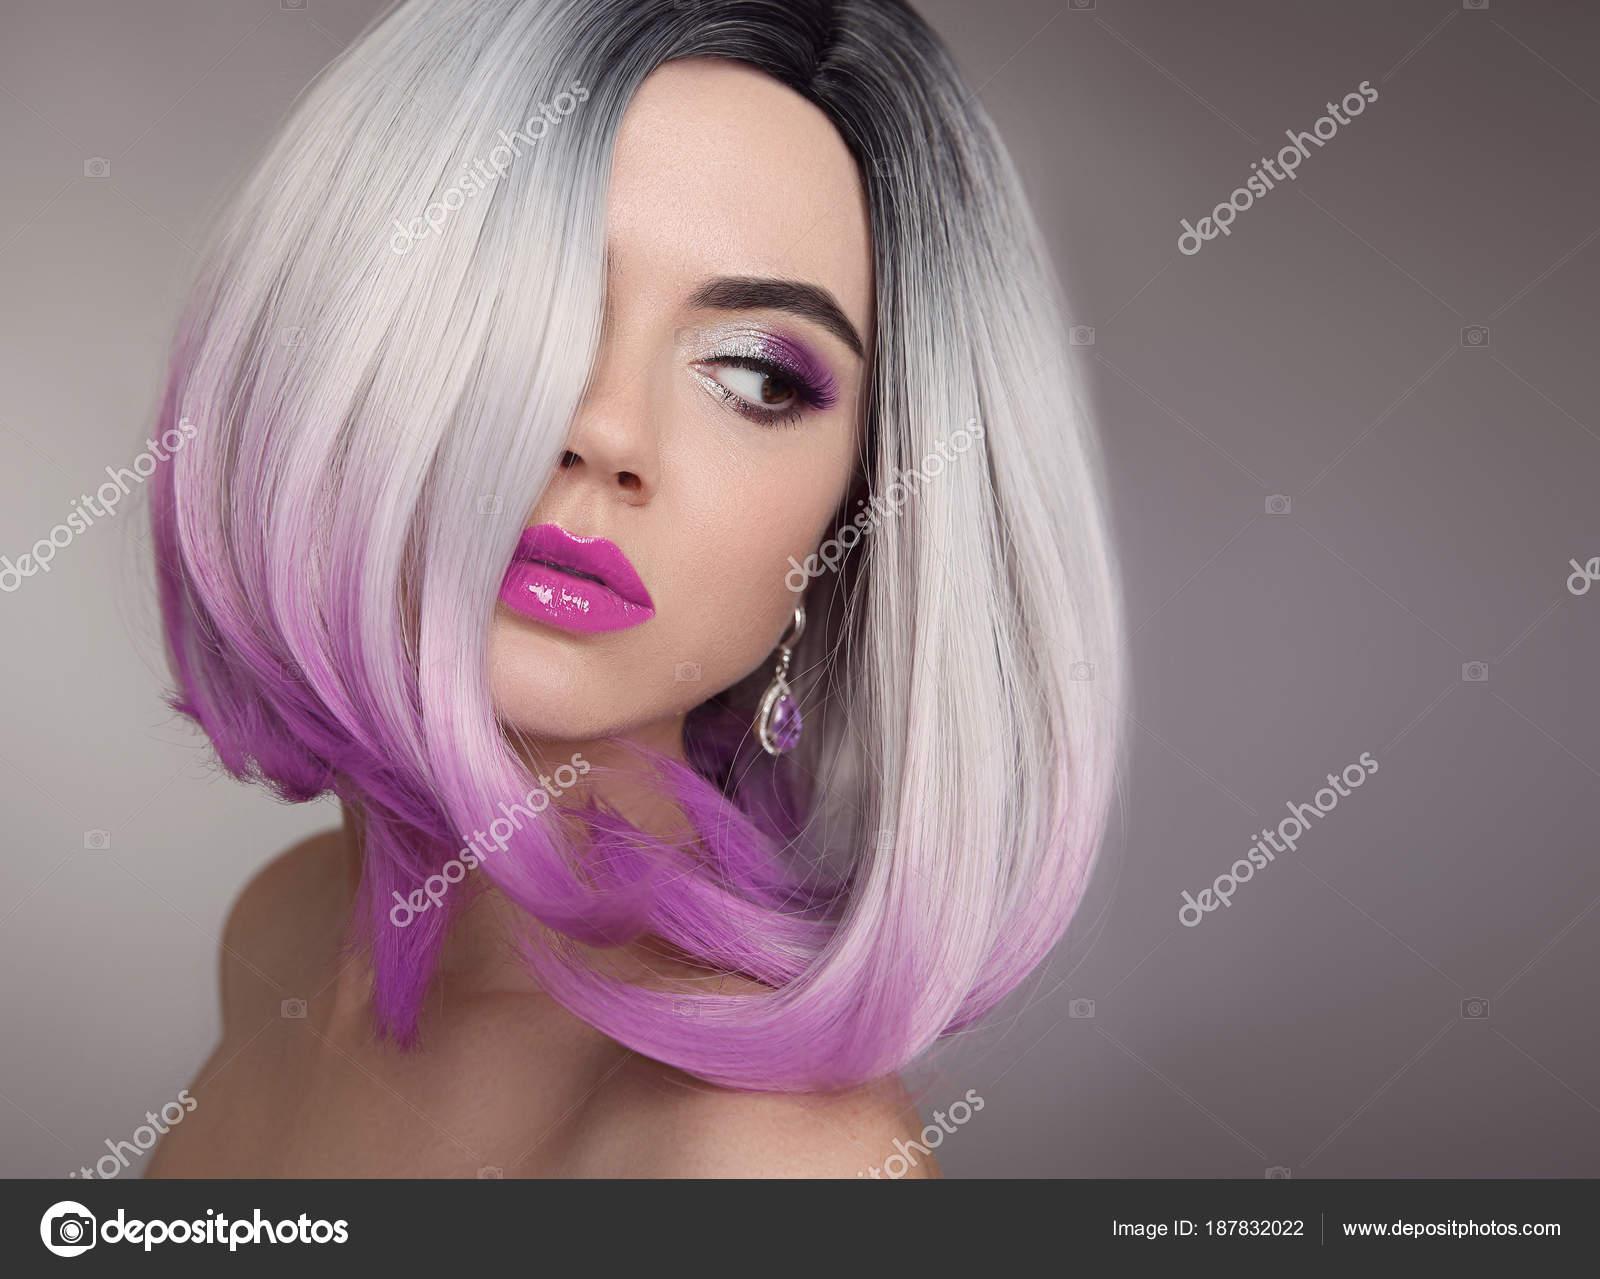 Ombre Bob Blonde Short Hairstyle Purple Makeup Beautiful Hair